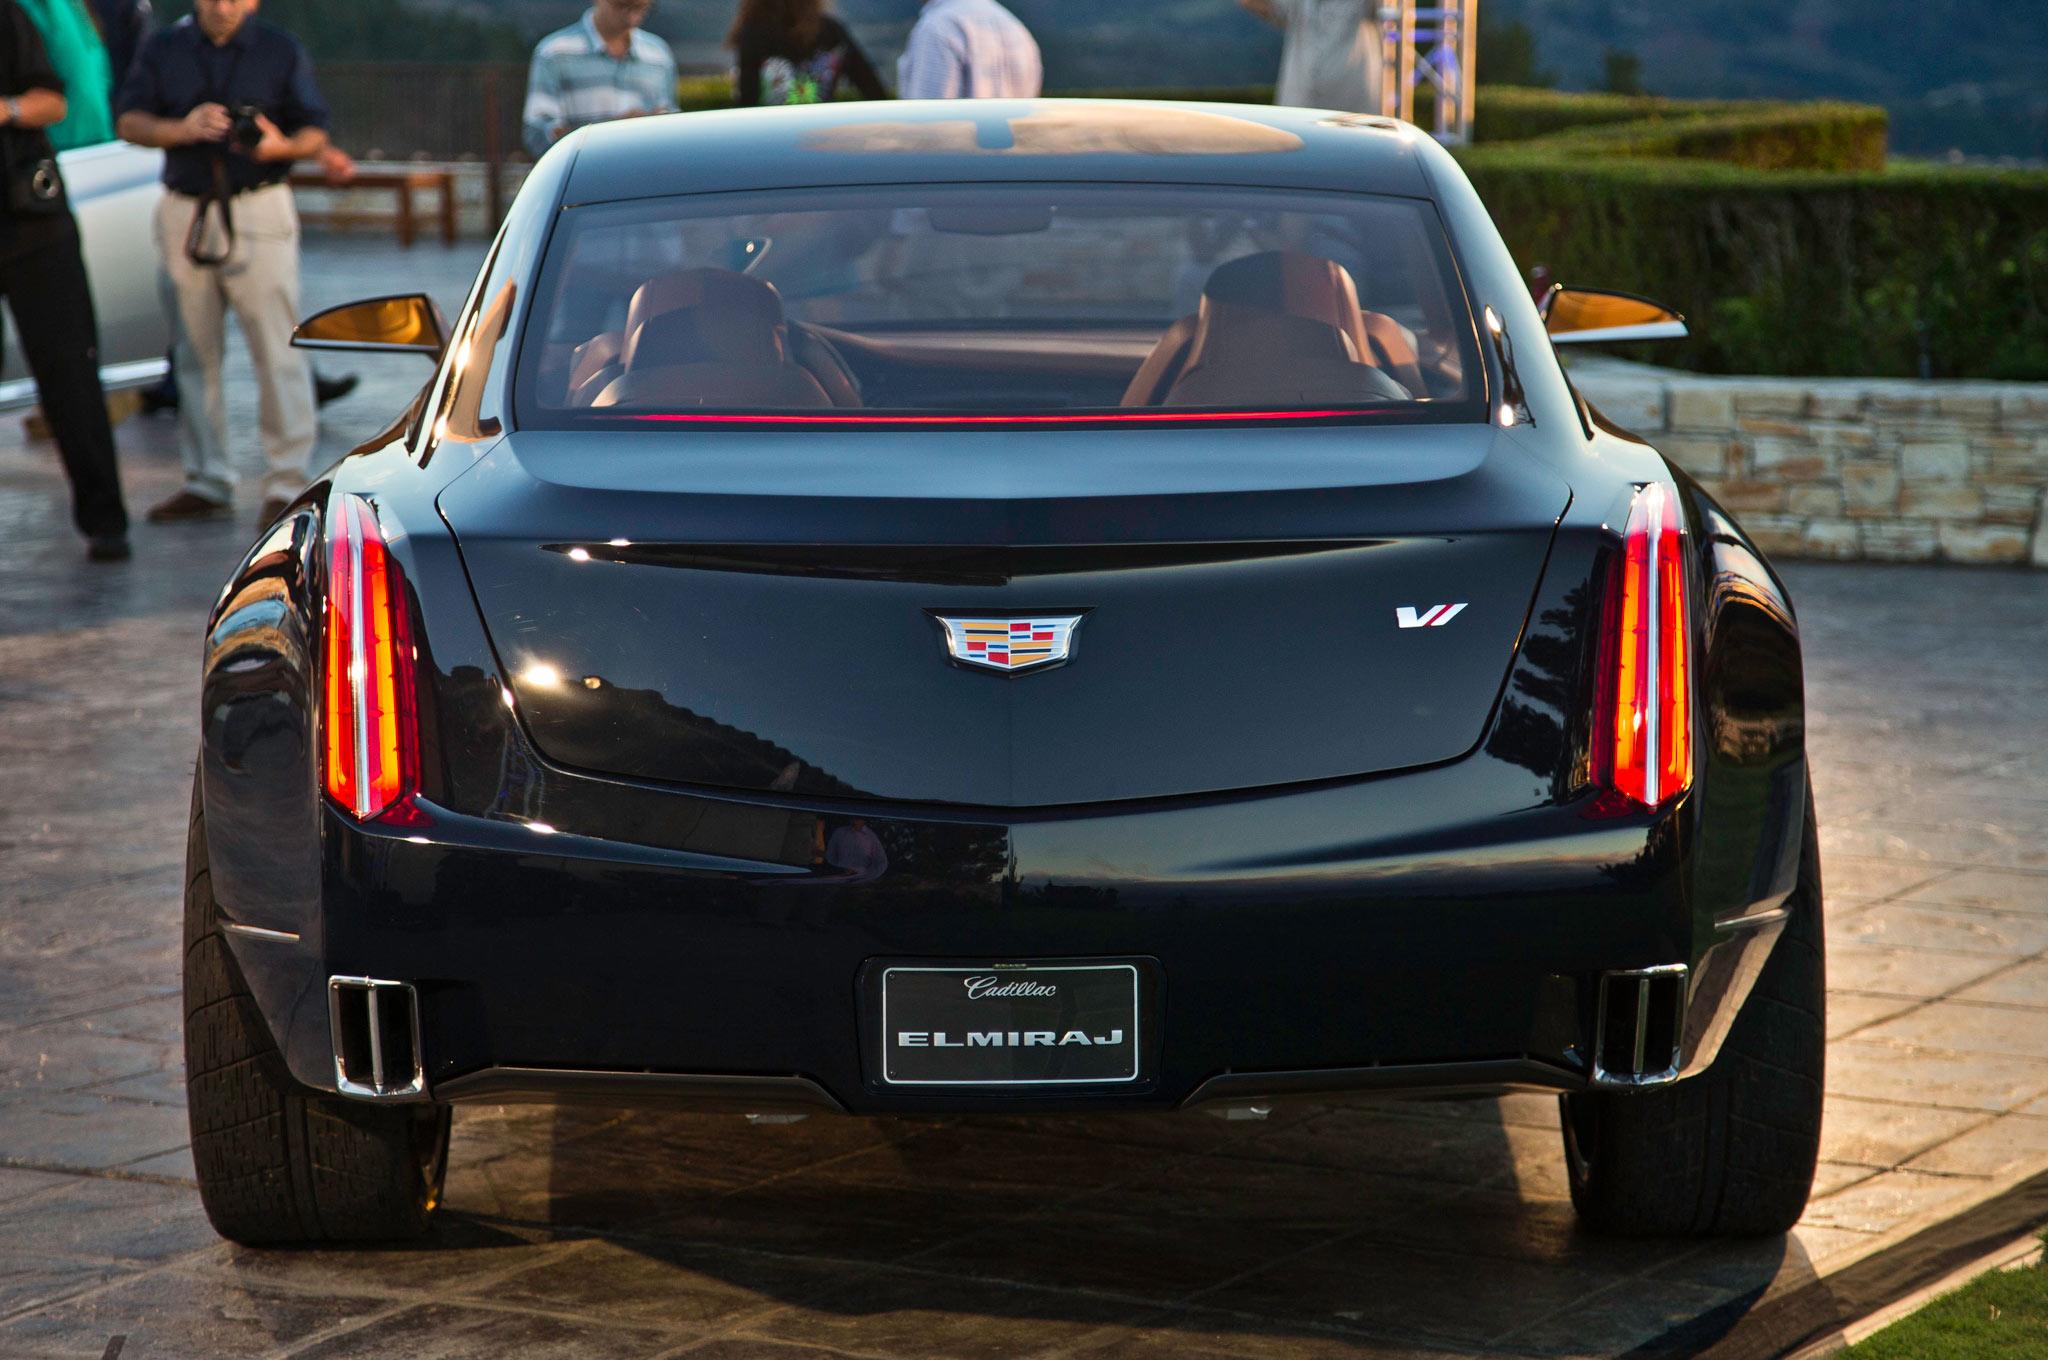 2013 Cadillac Elmiraj Concept Revealed At Pebble Beach